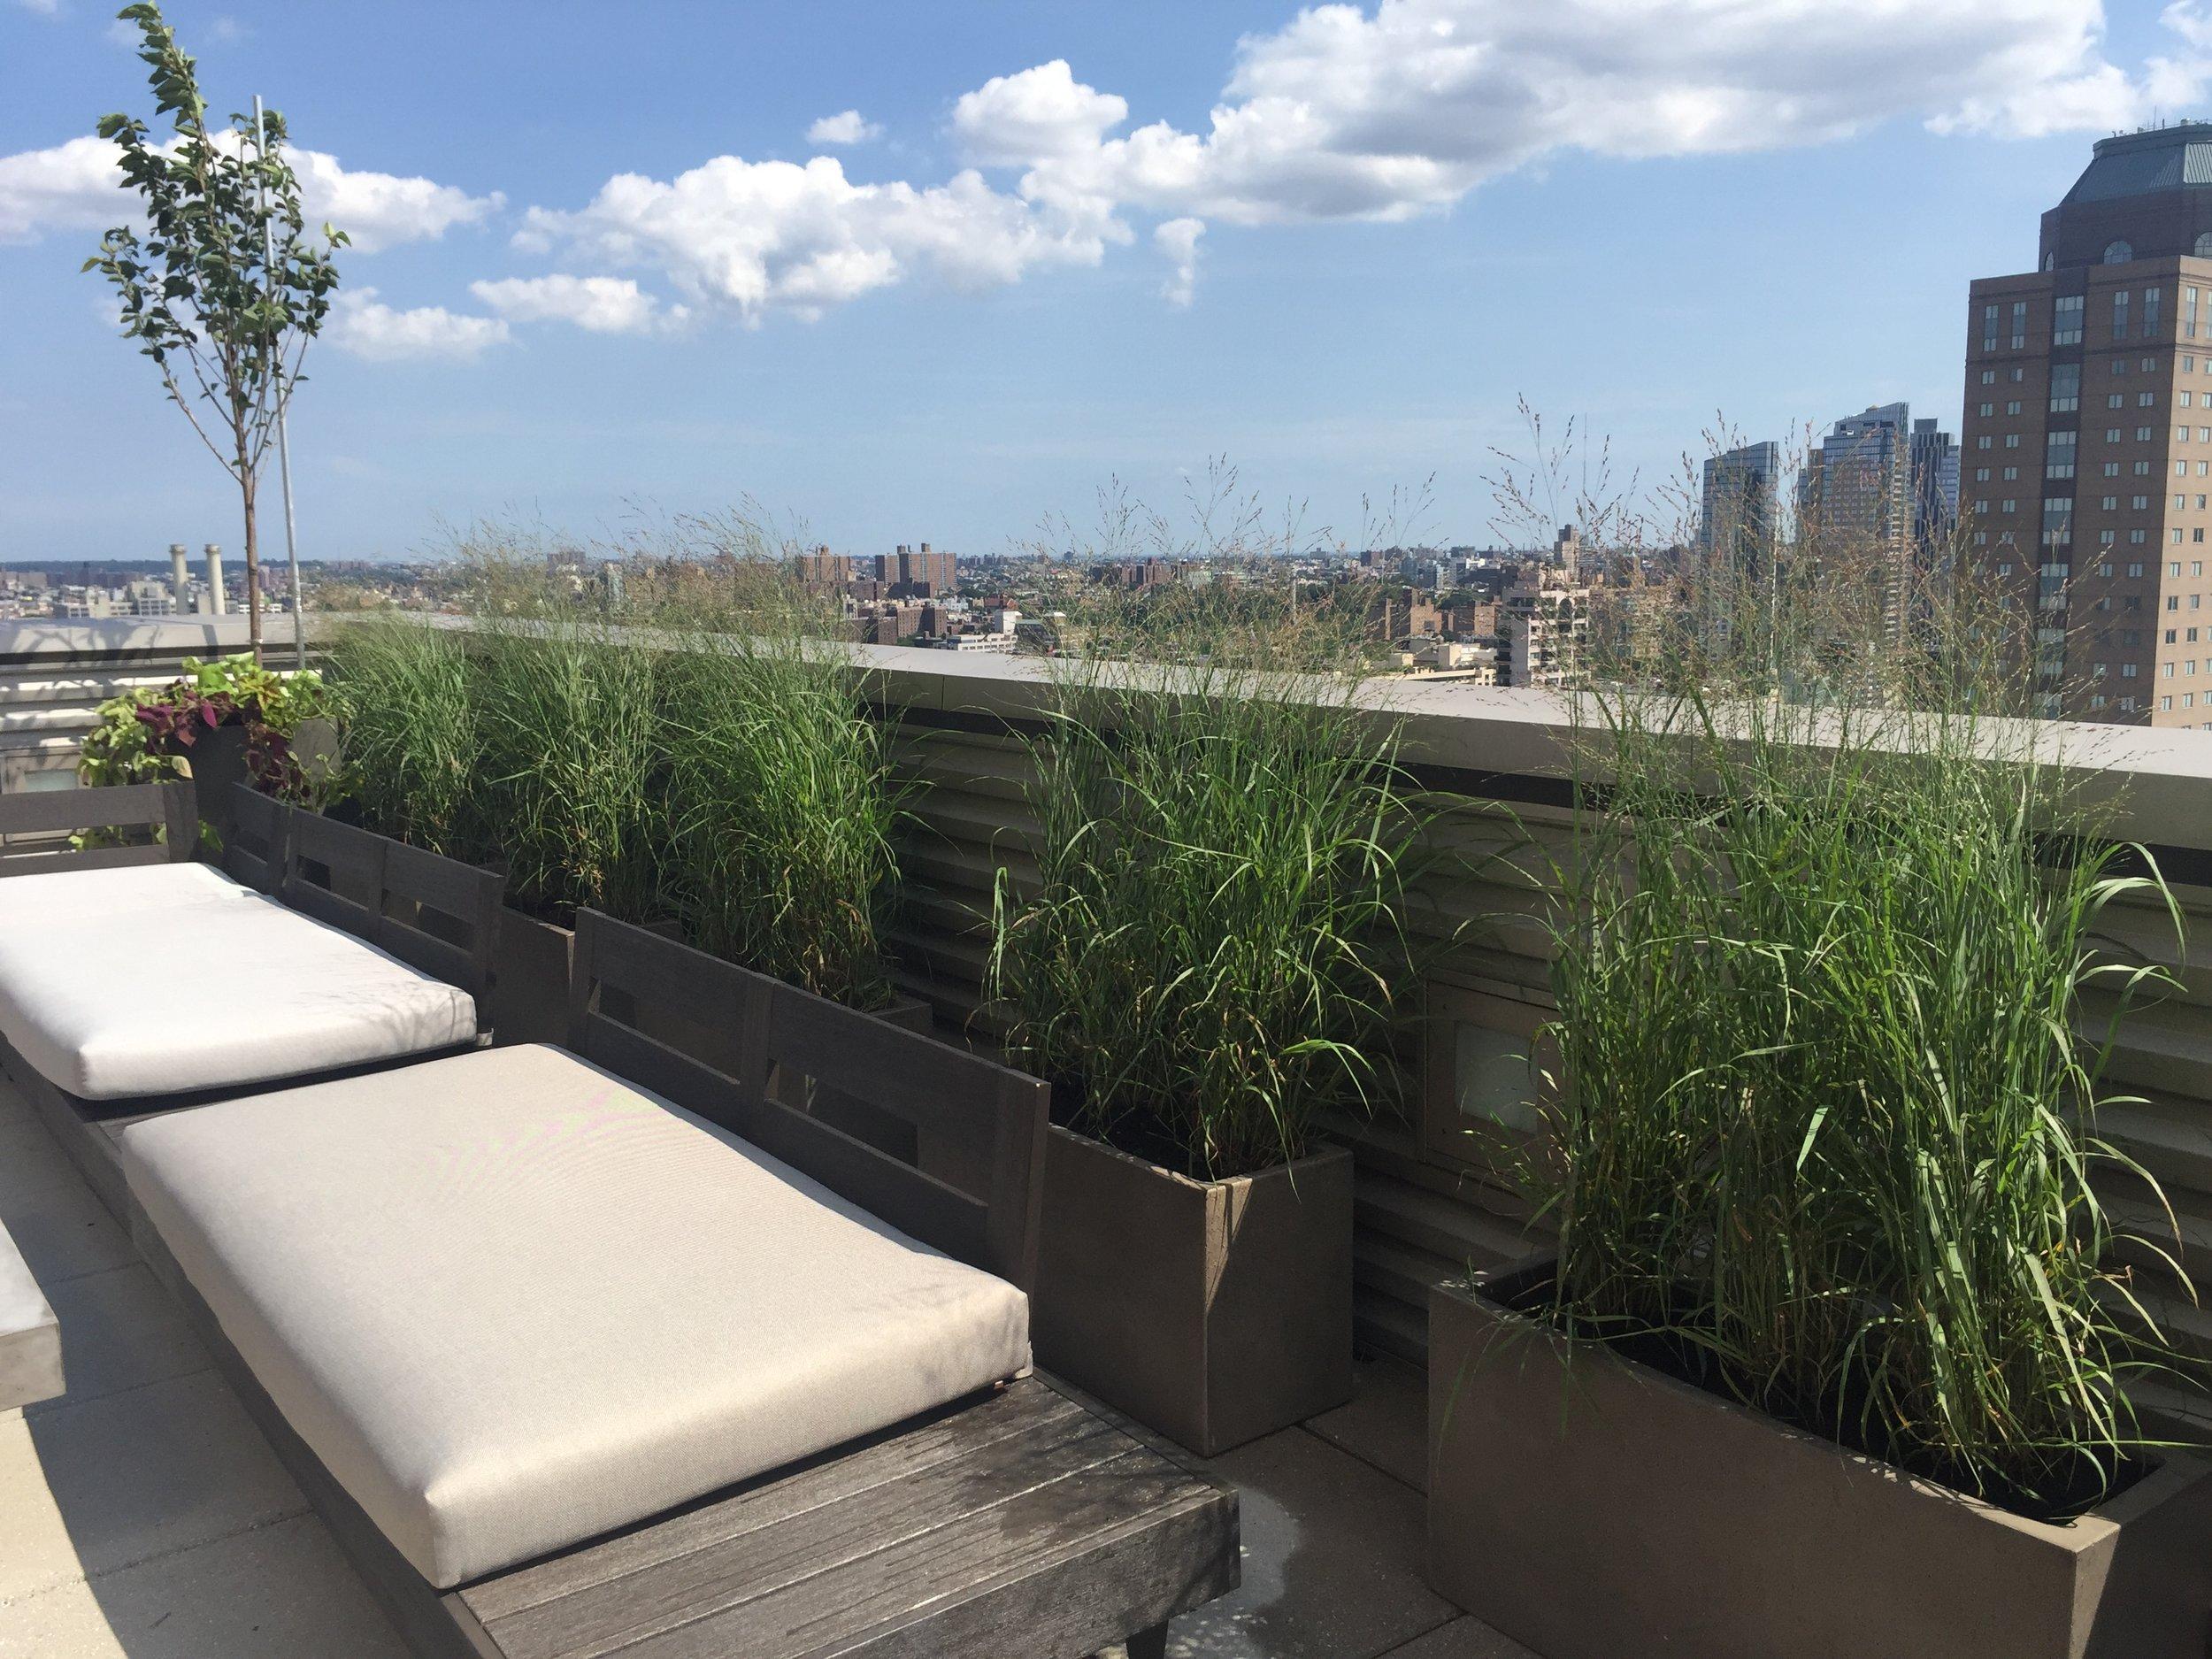 Native Grasses overlooking Lower Manhattan in Dumbo